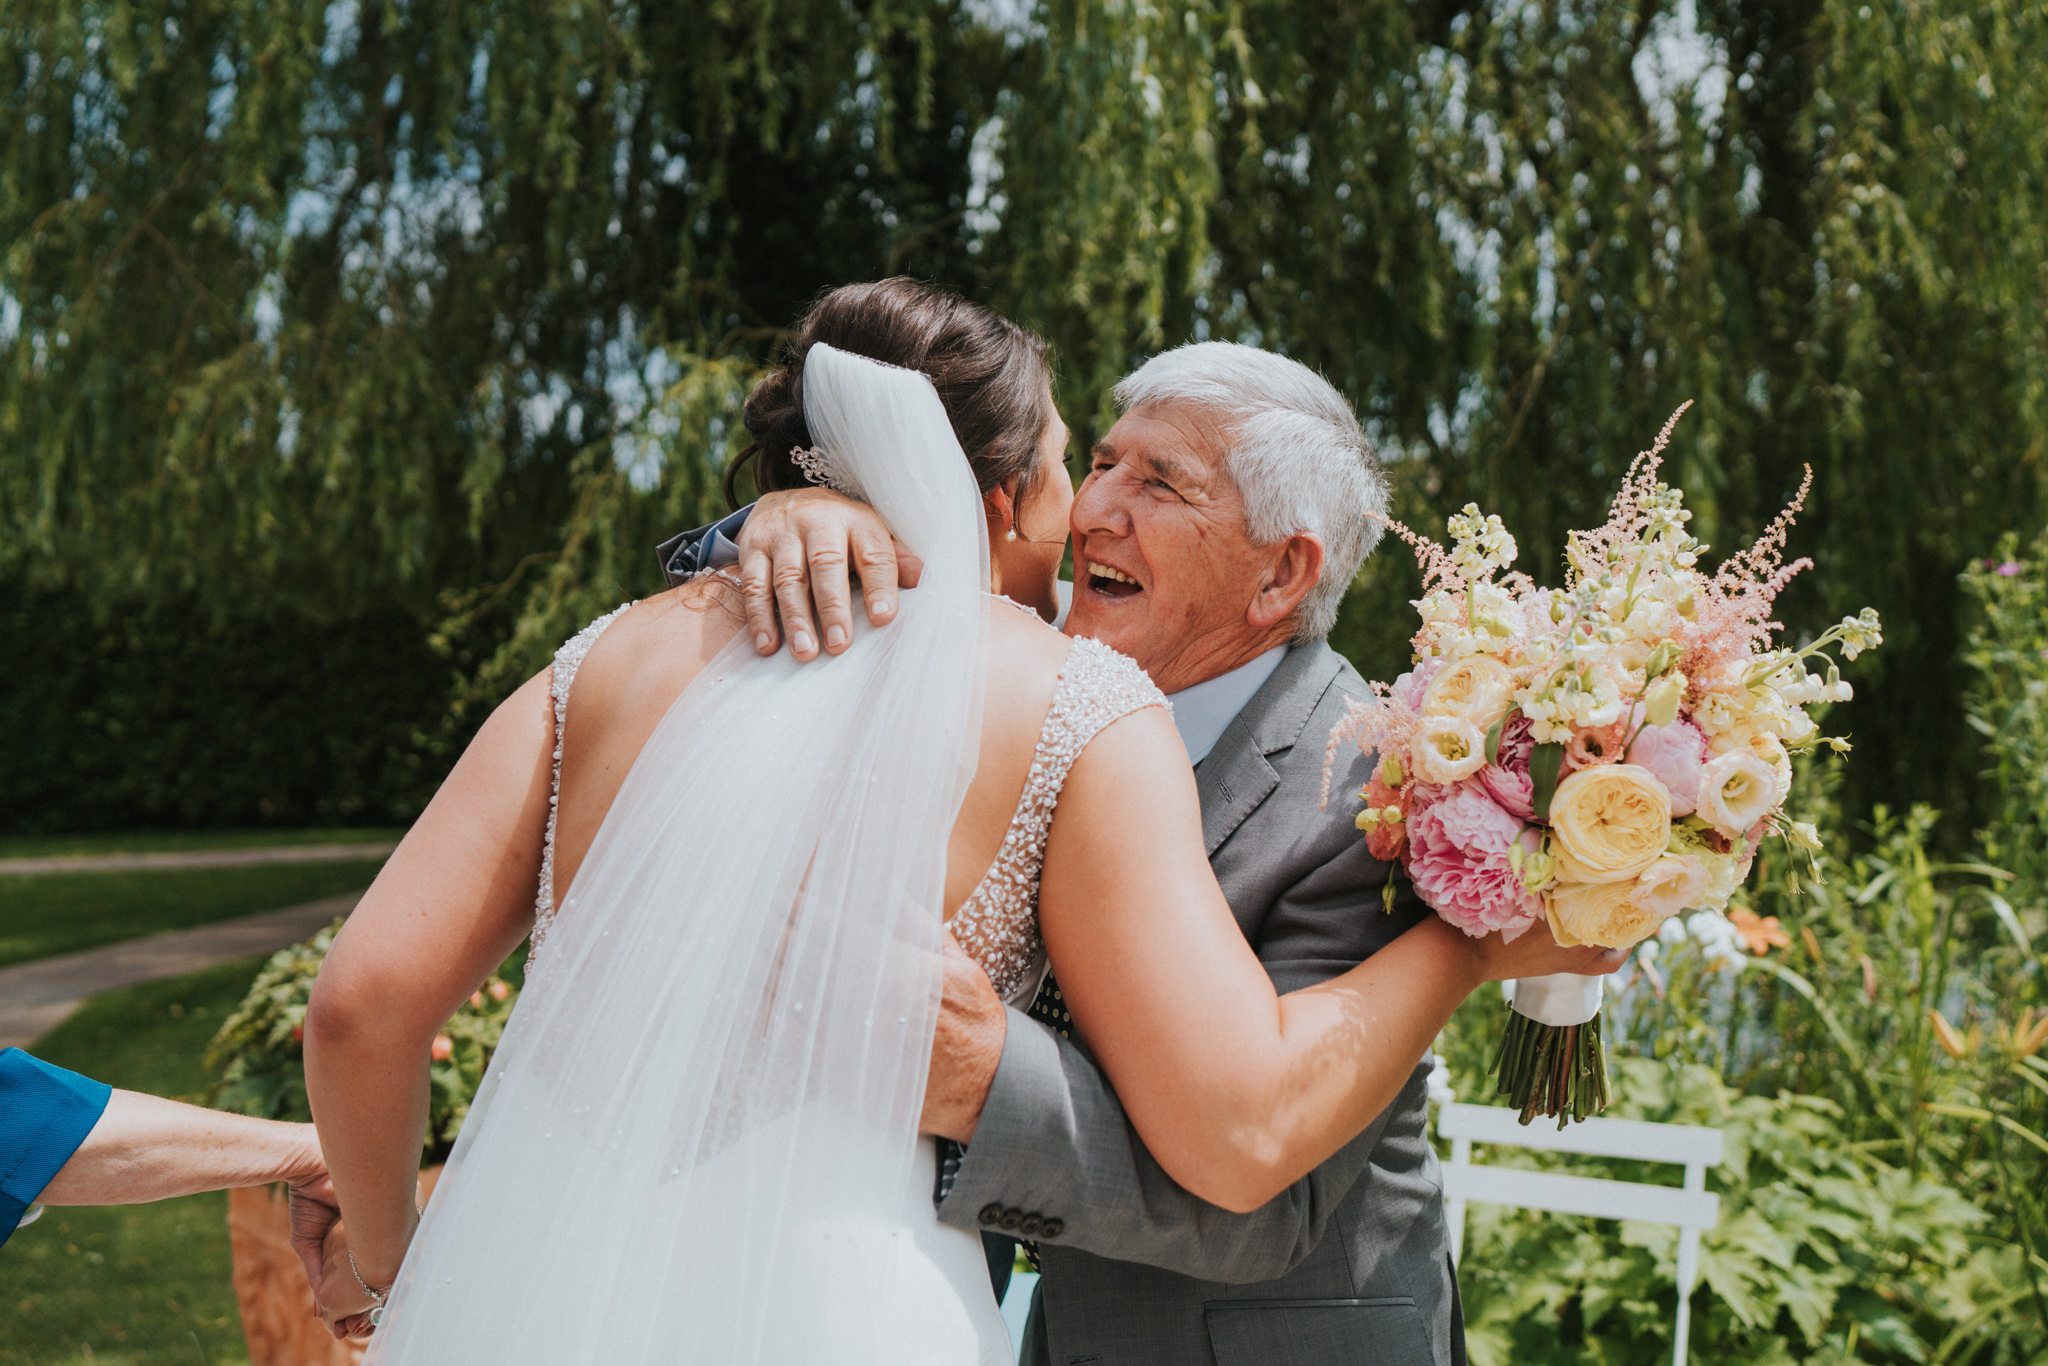 danielle-and-gareths-boho-wedding-previews-at-high-house-weddings-grace-elizabeth-colchester-essex-suffolk-norfolk-devon-alternative-wedding-and-lifestyle-photographer (35 of 76).jpg